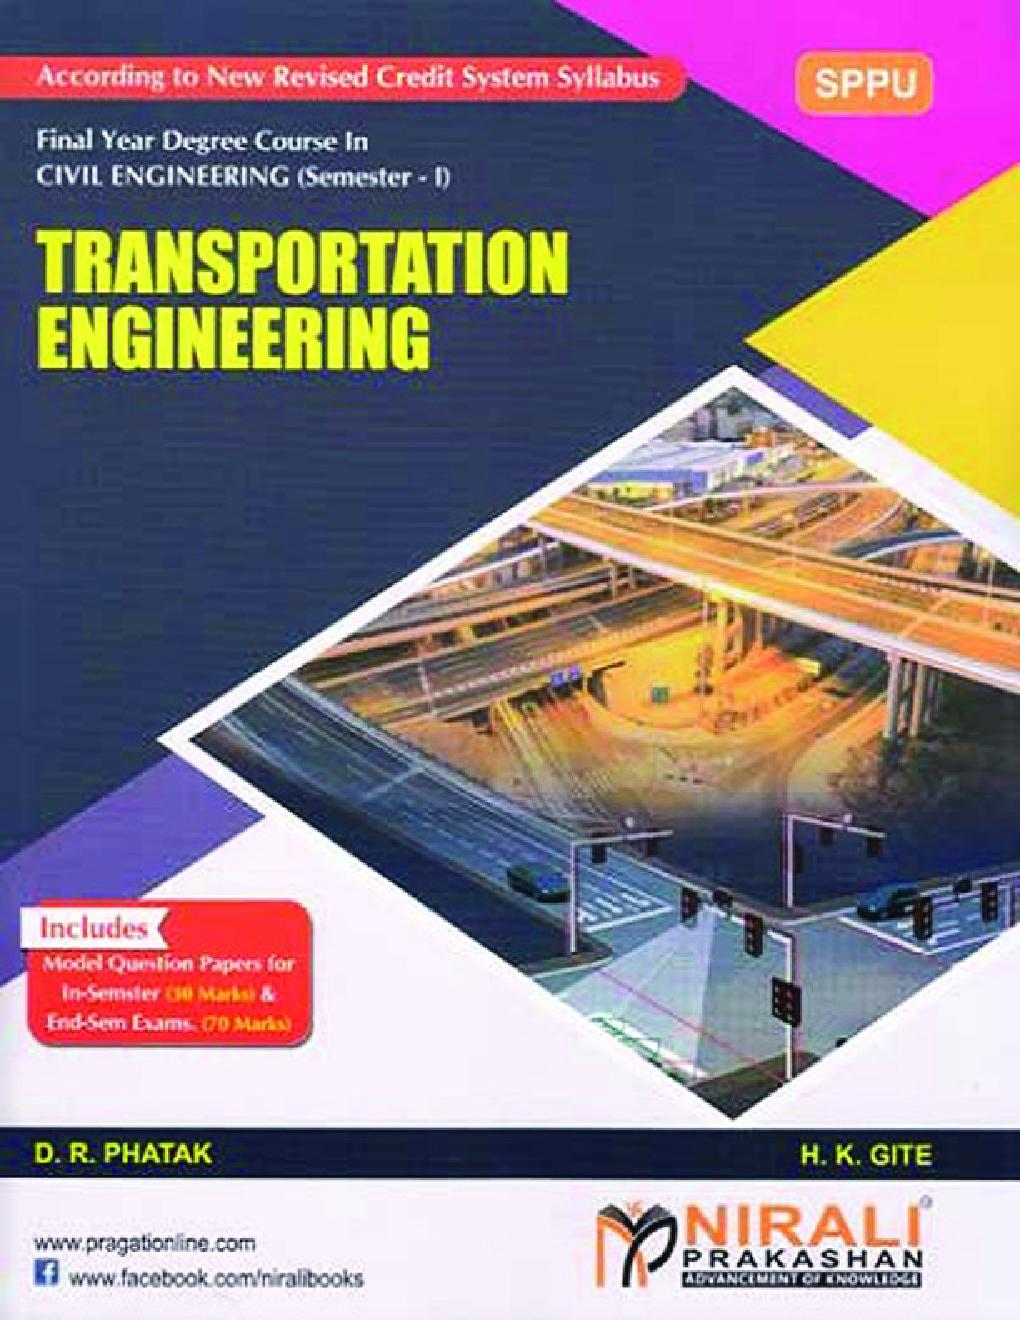 Transportation Engineering - Page 1